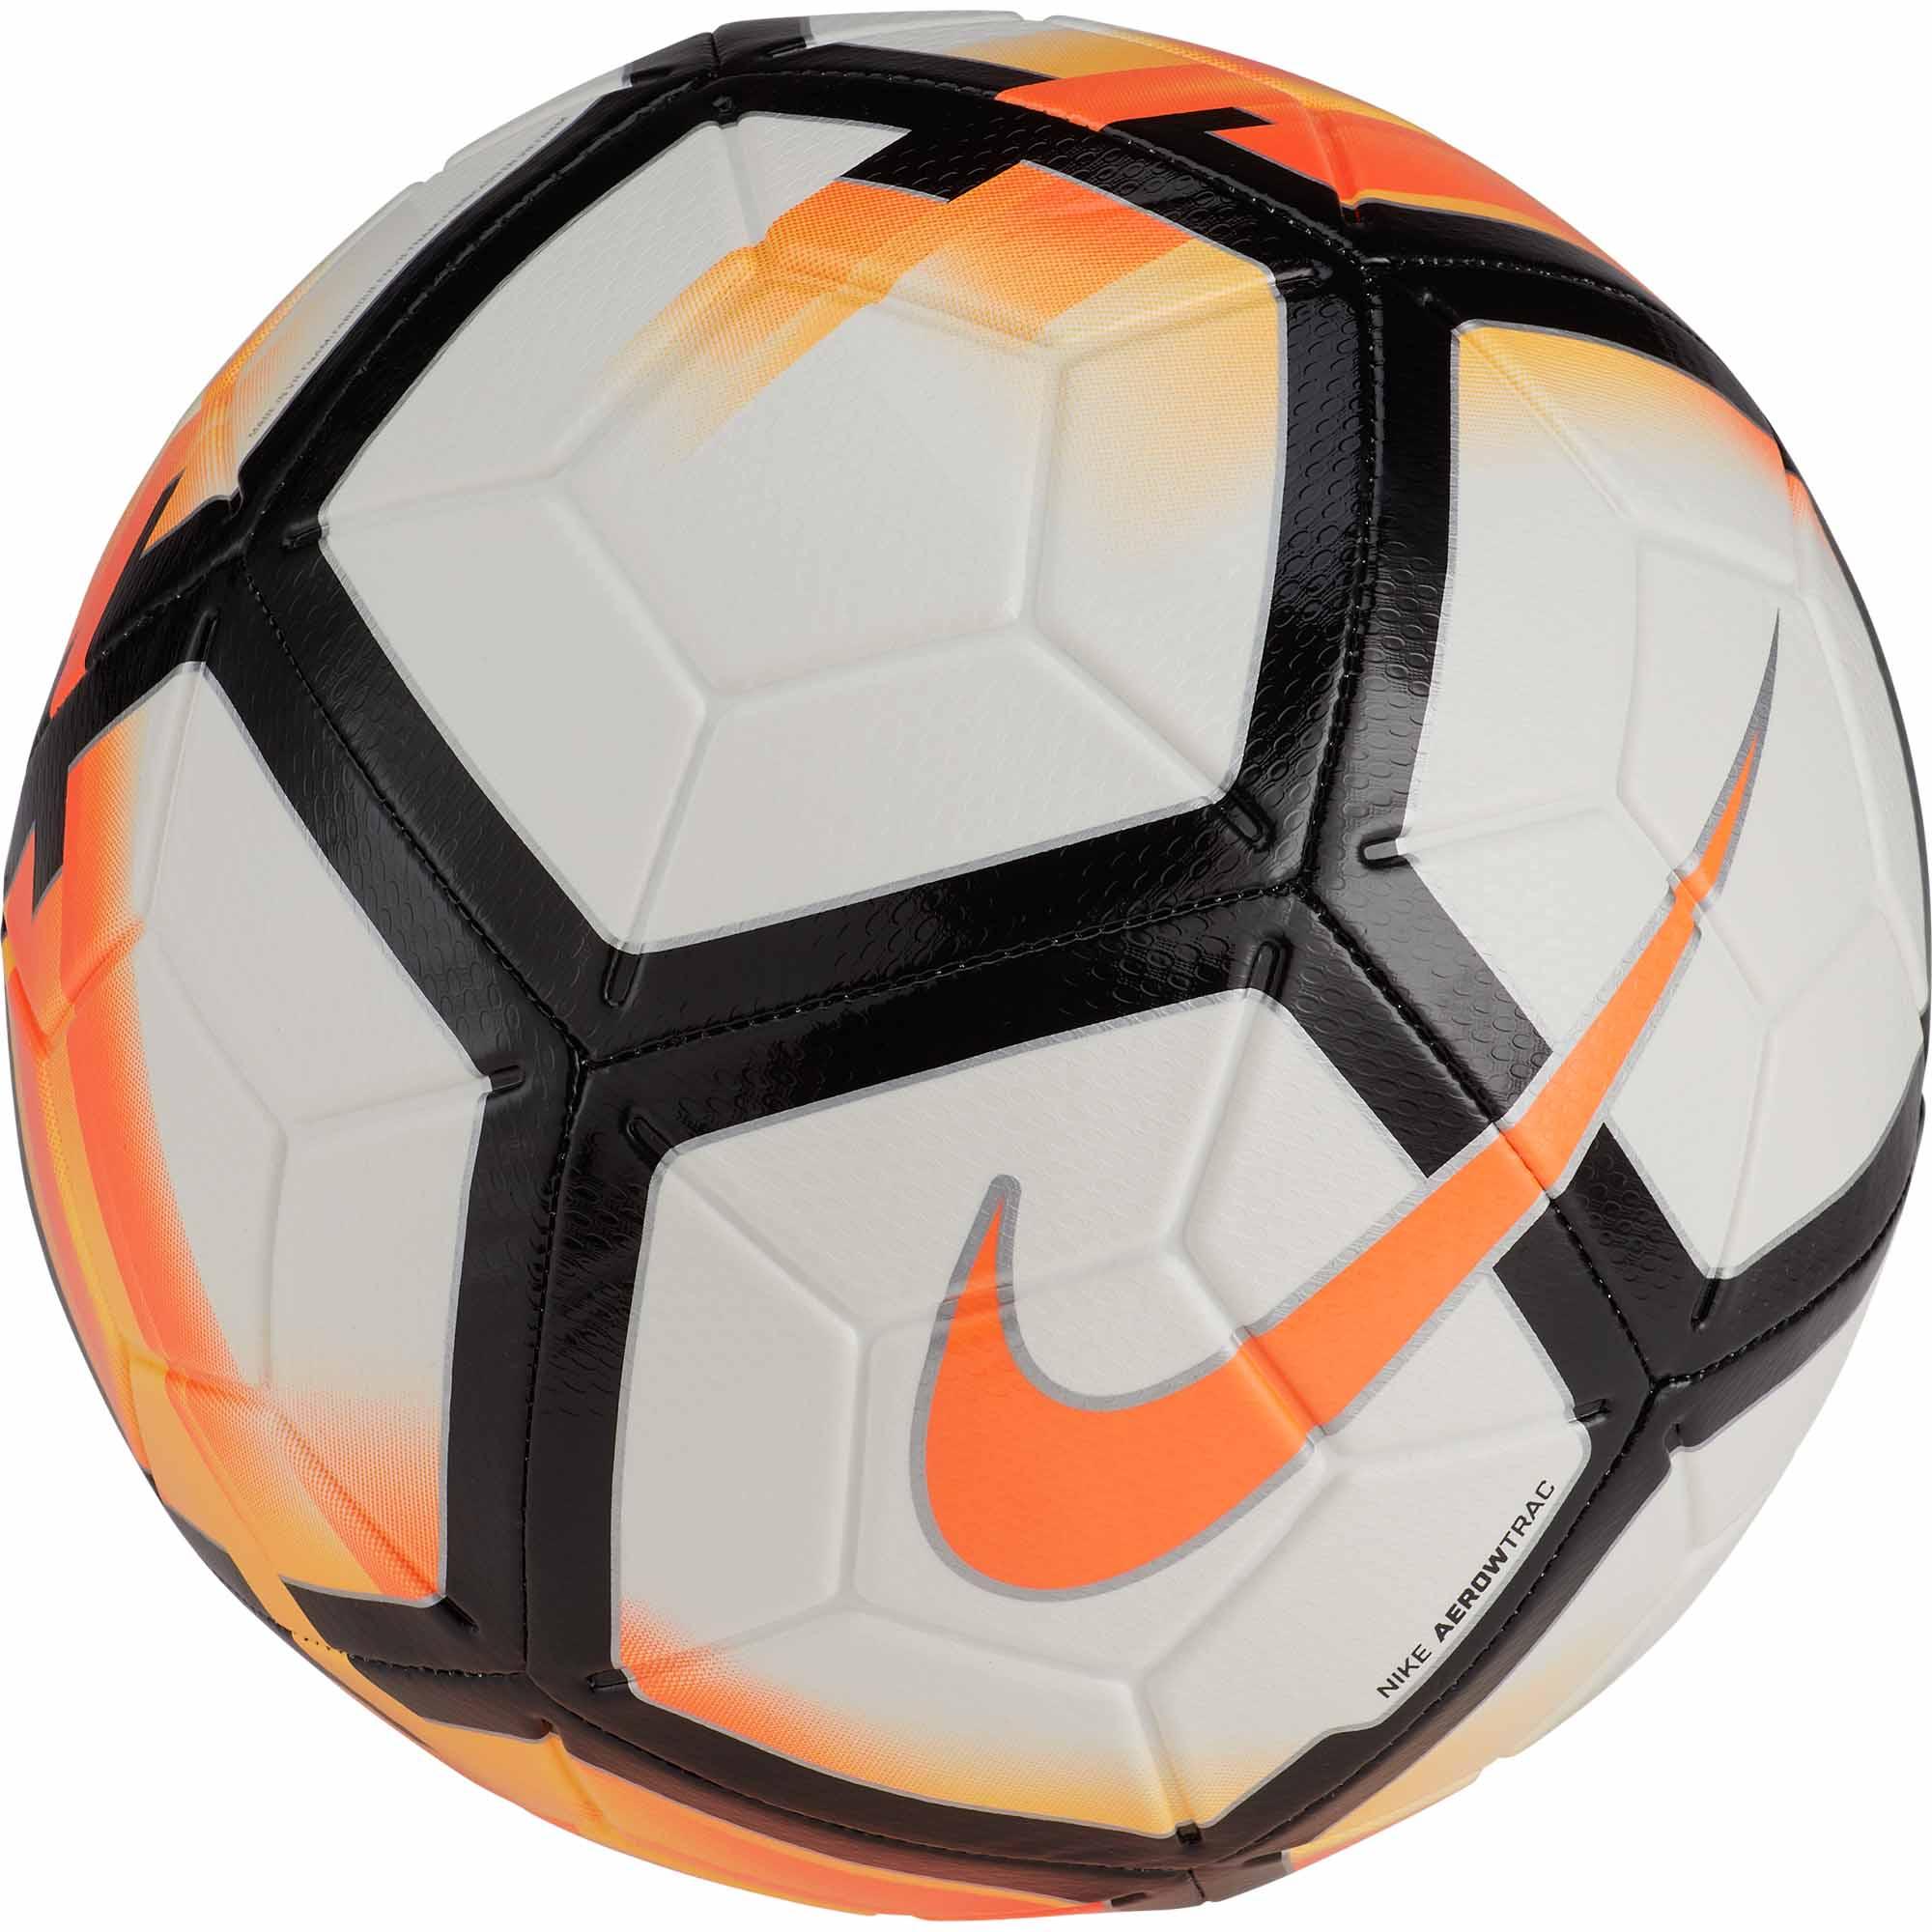 nike strike soccer ball white total orange soccerpro com